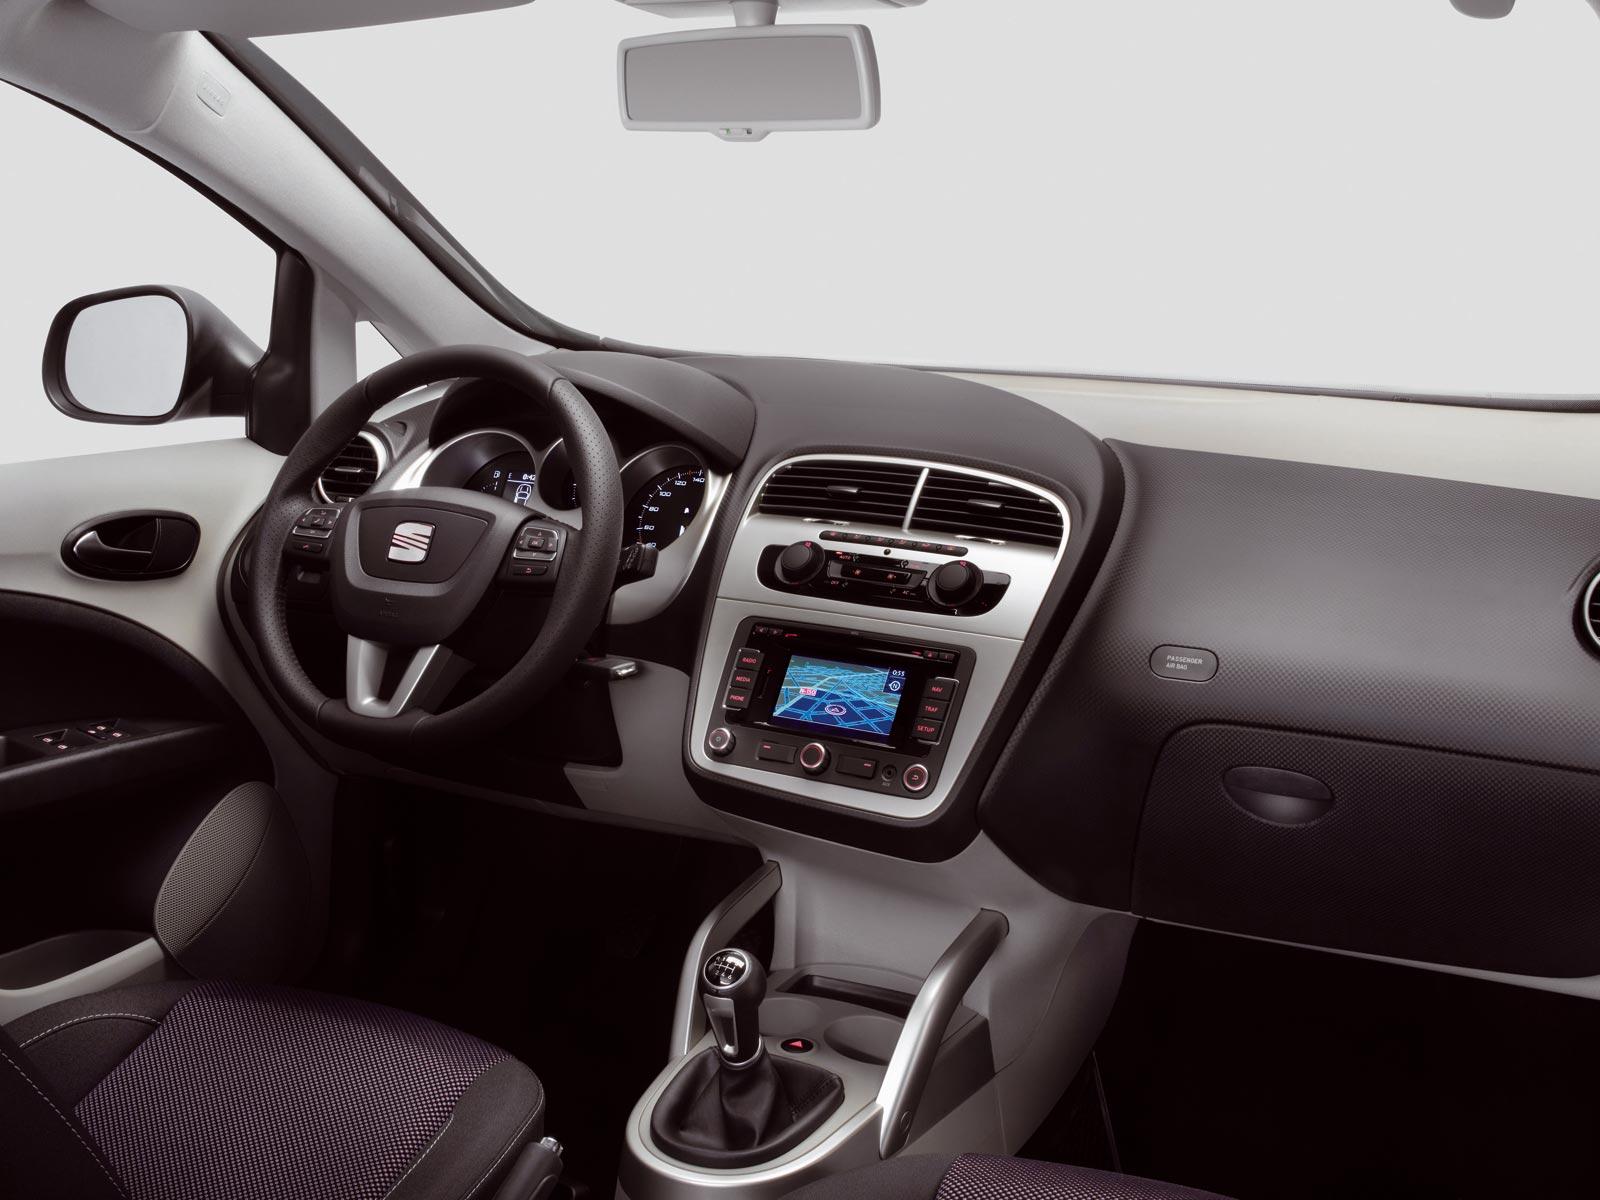 2009 Seat Altea XL (c) Seat